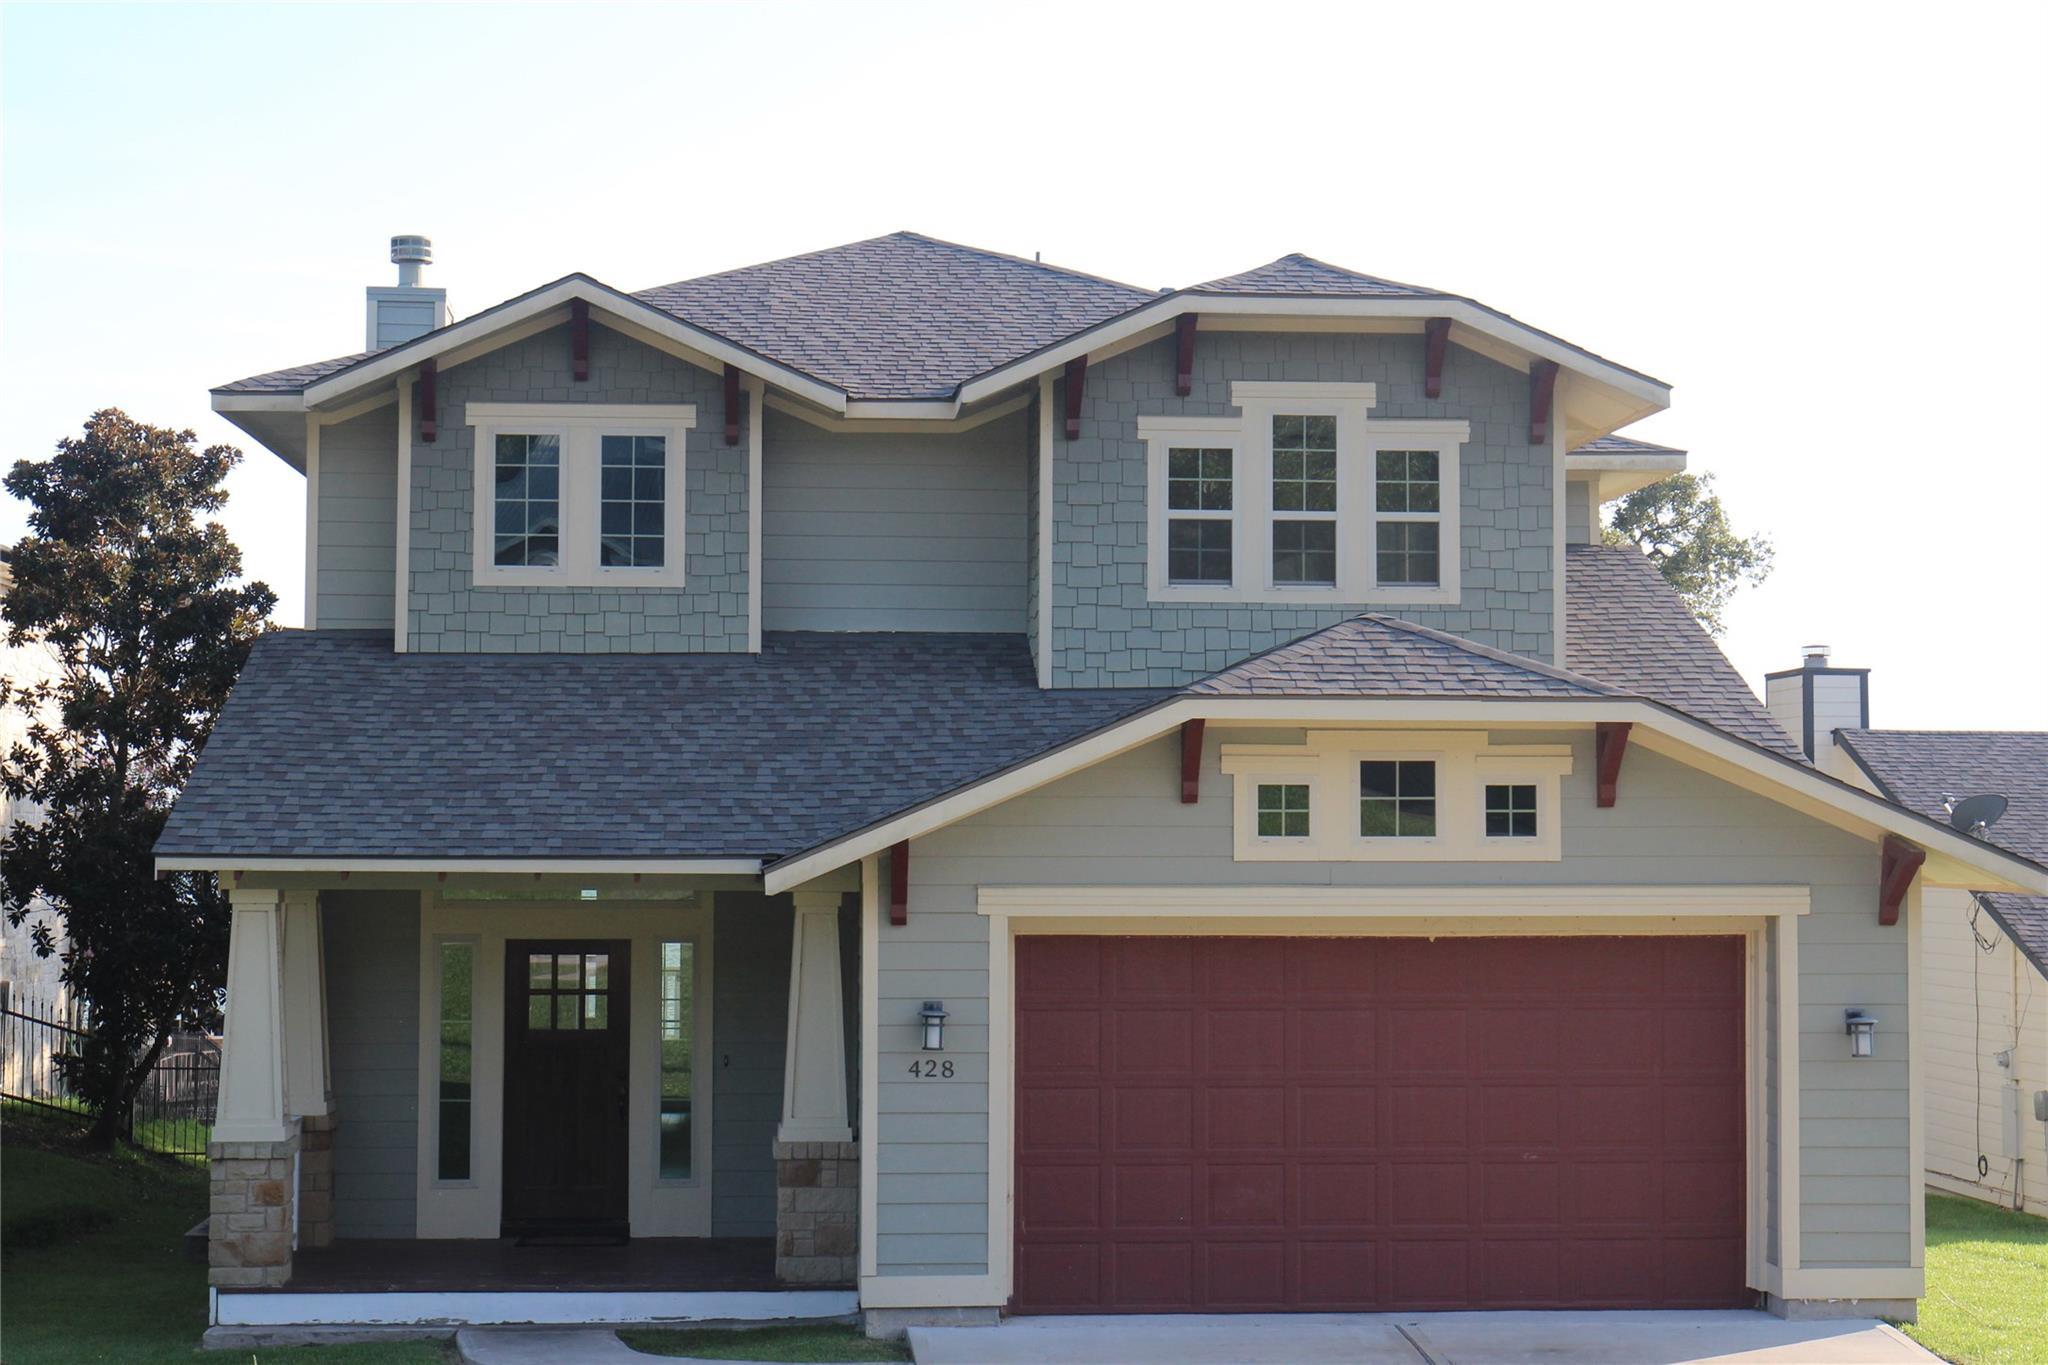 428 Bridgelanding Property Photo - Onalaska, TX real estate listing